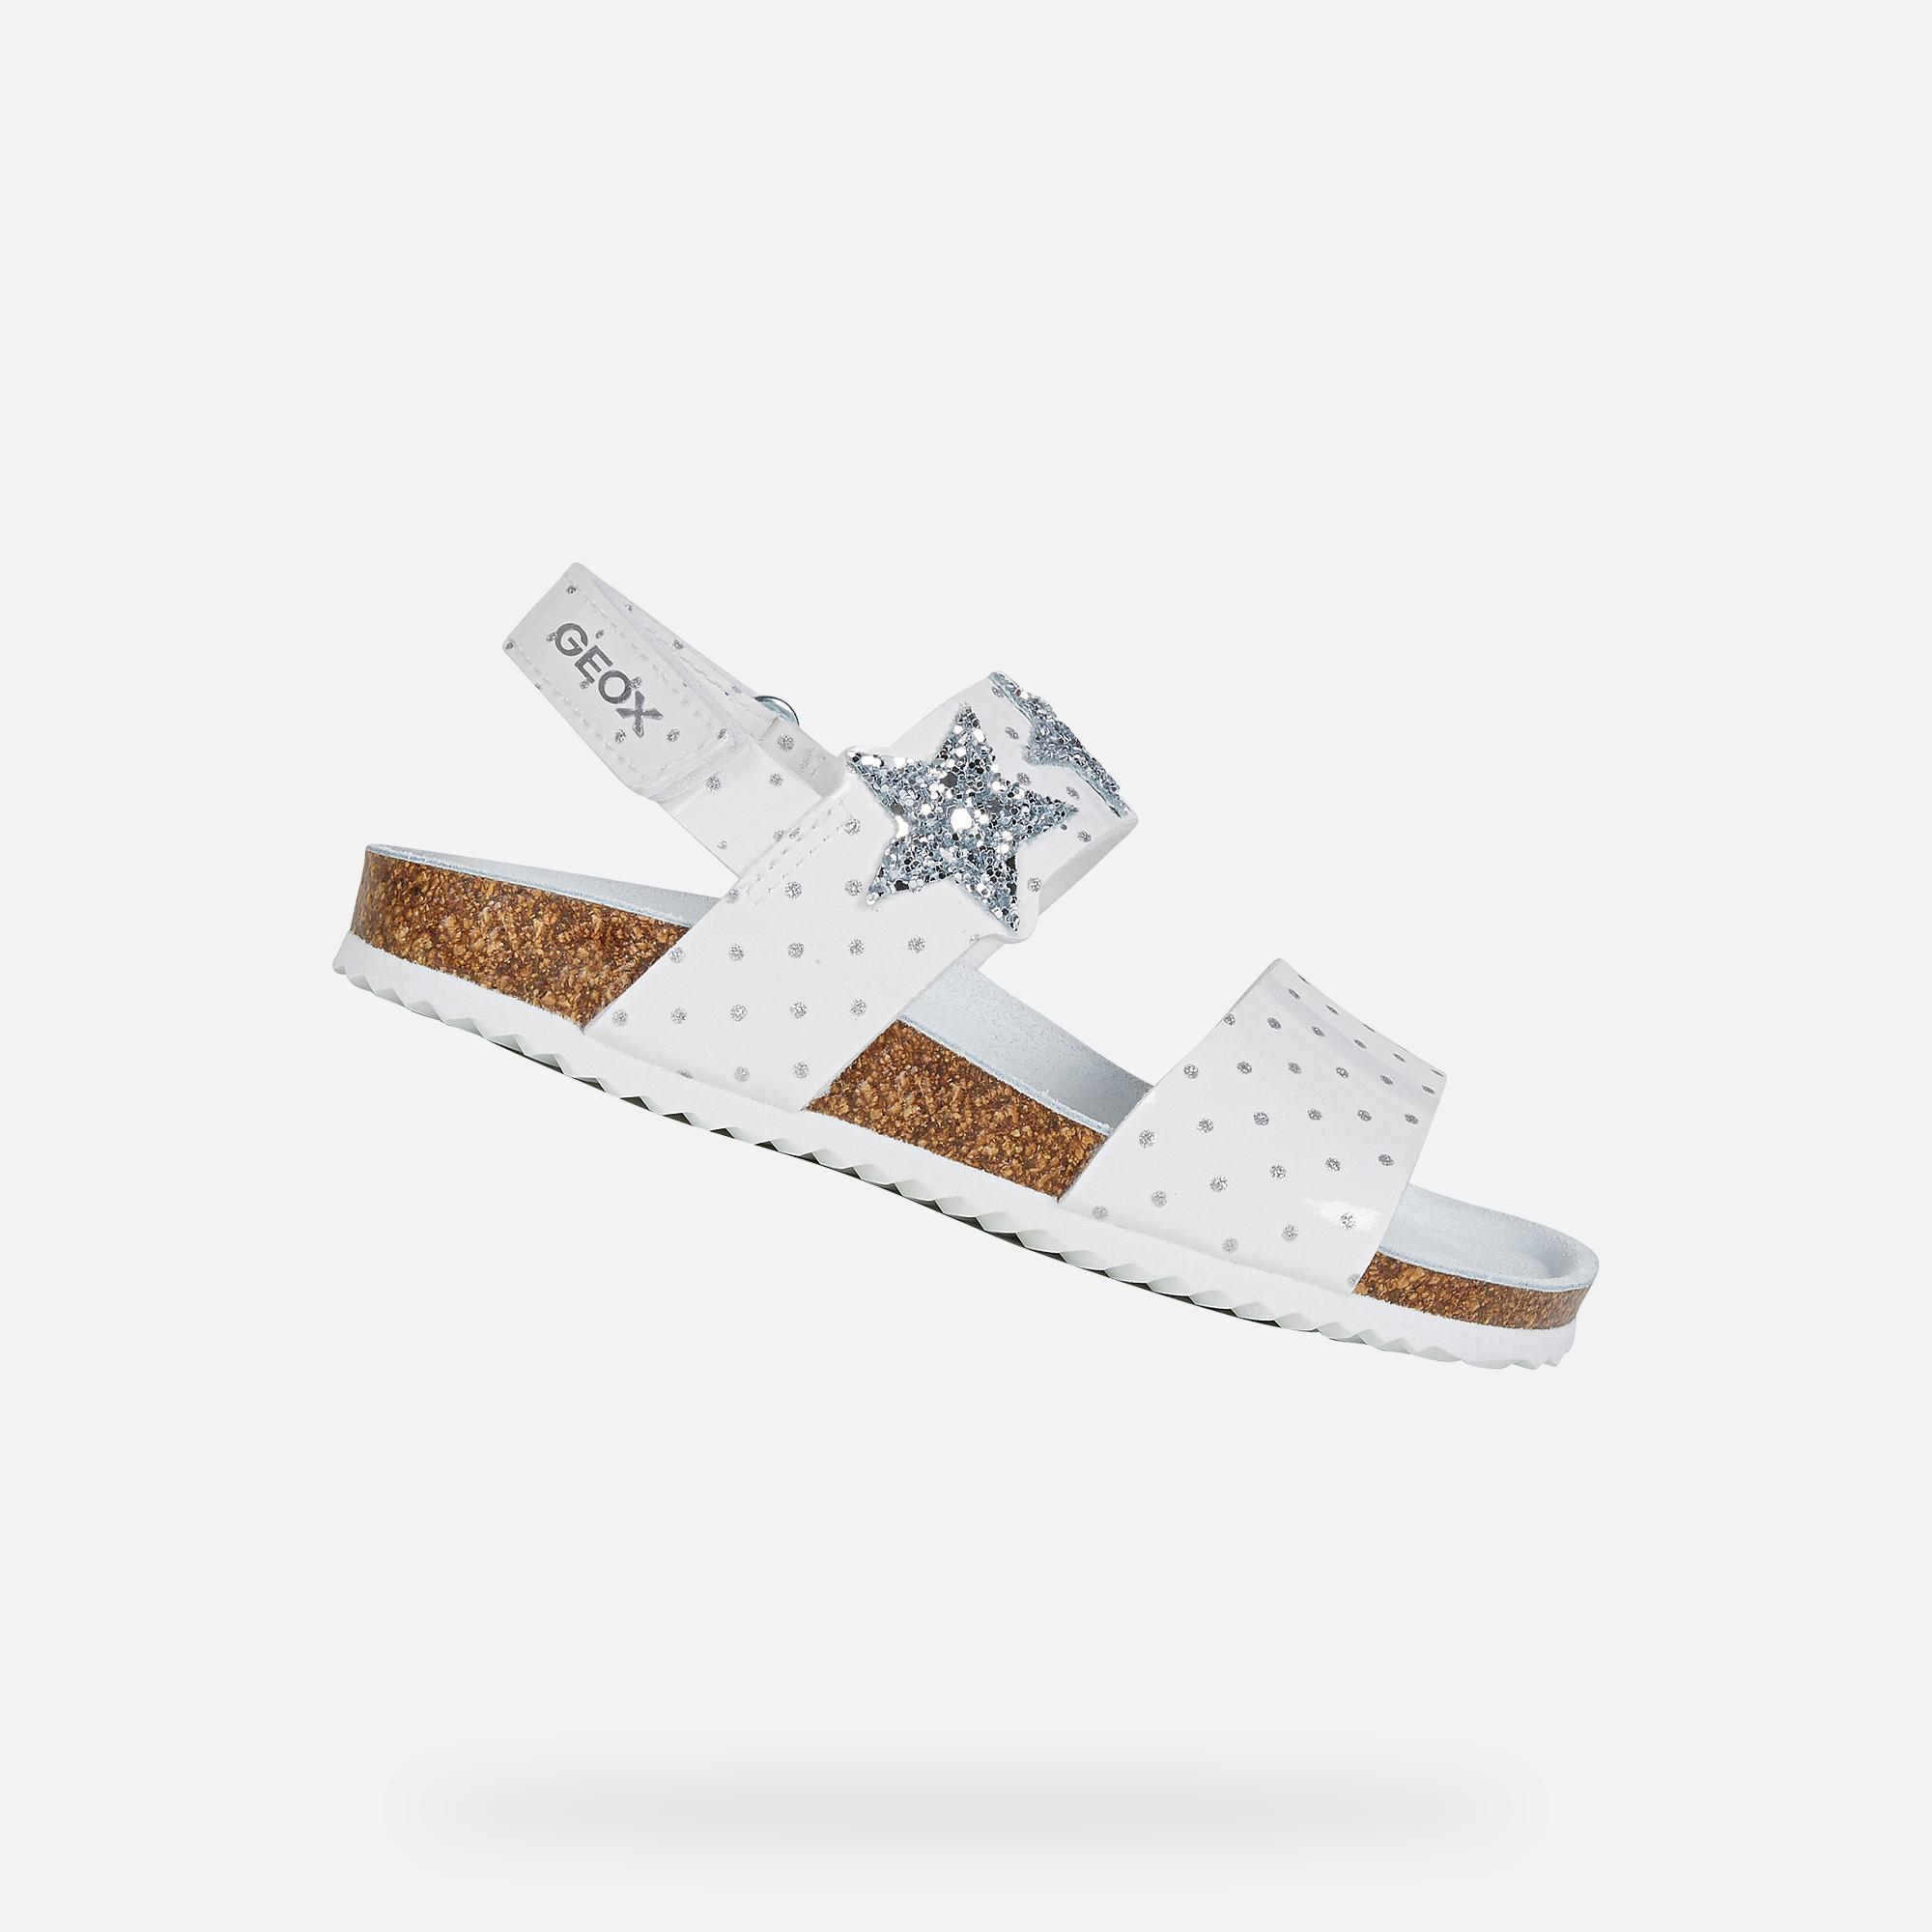 Geox ADRIEL GIRL: Weiß Sandalen   Geox ®